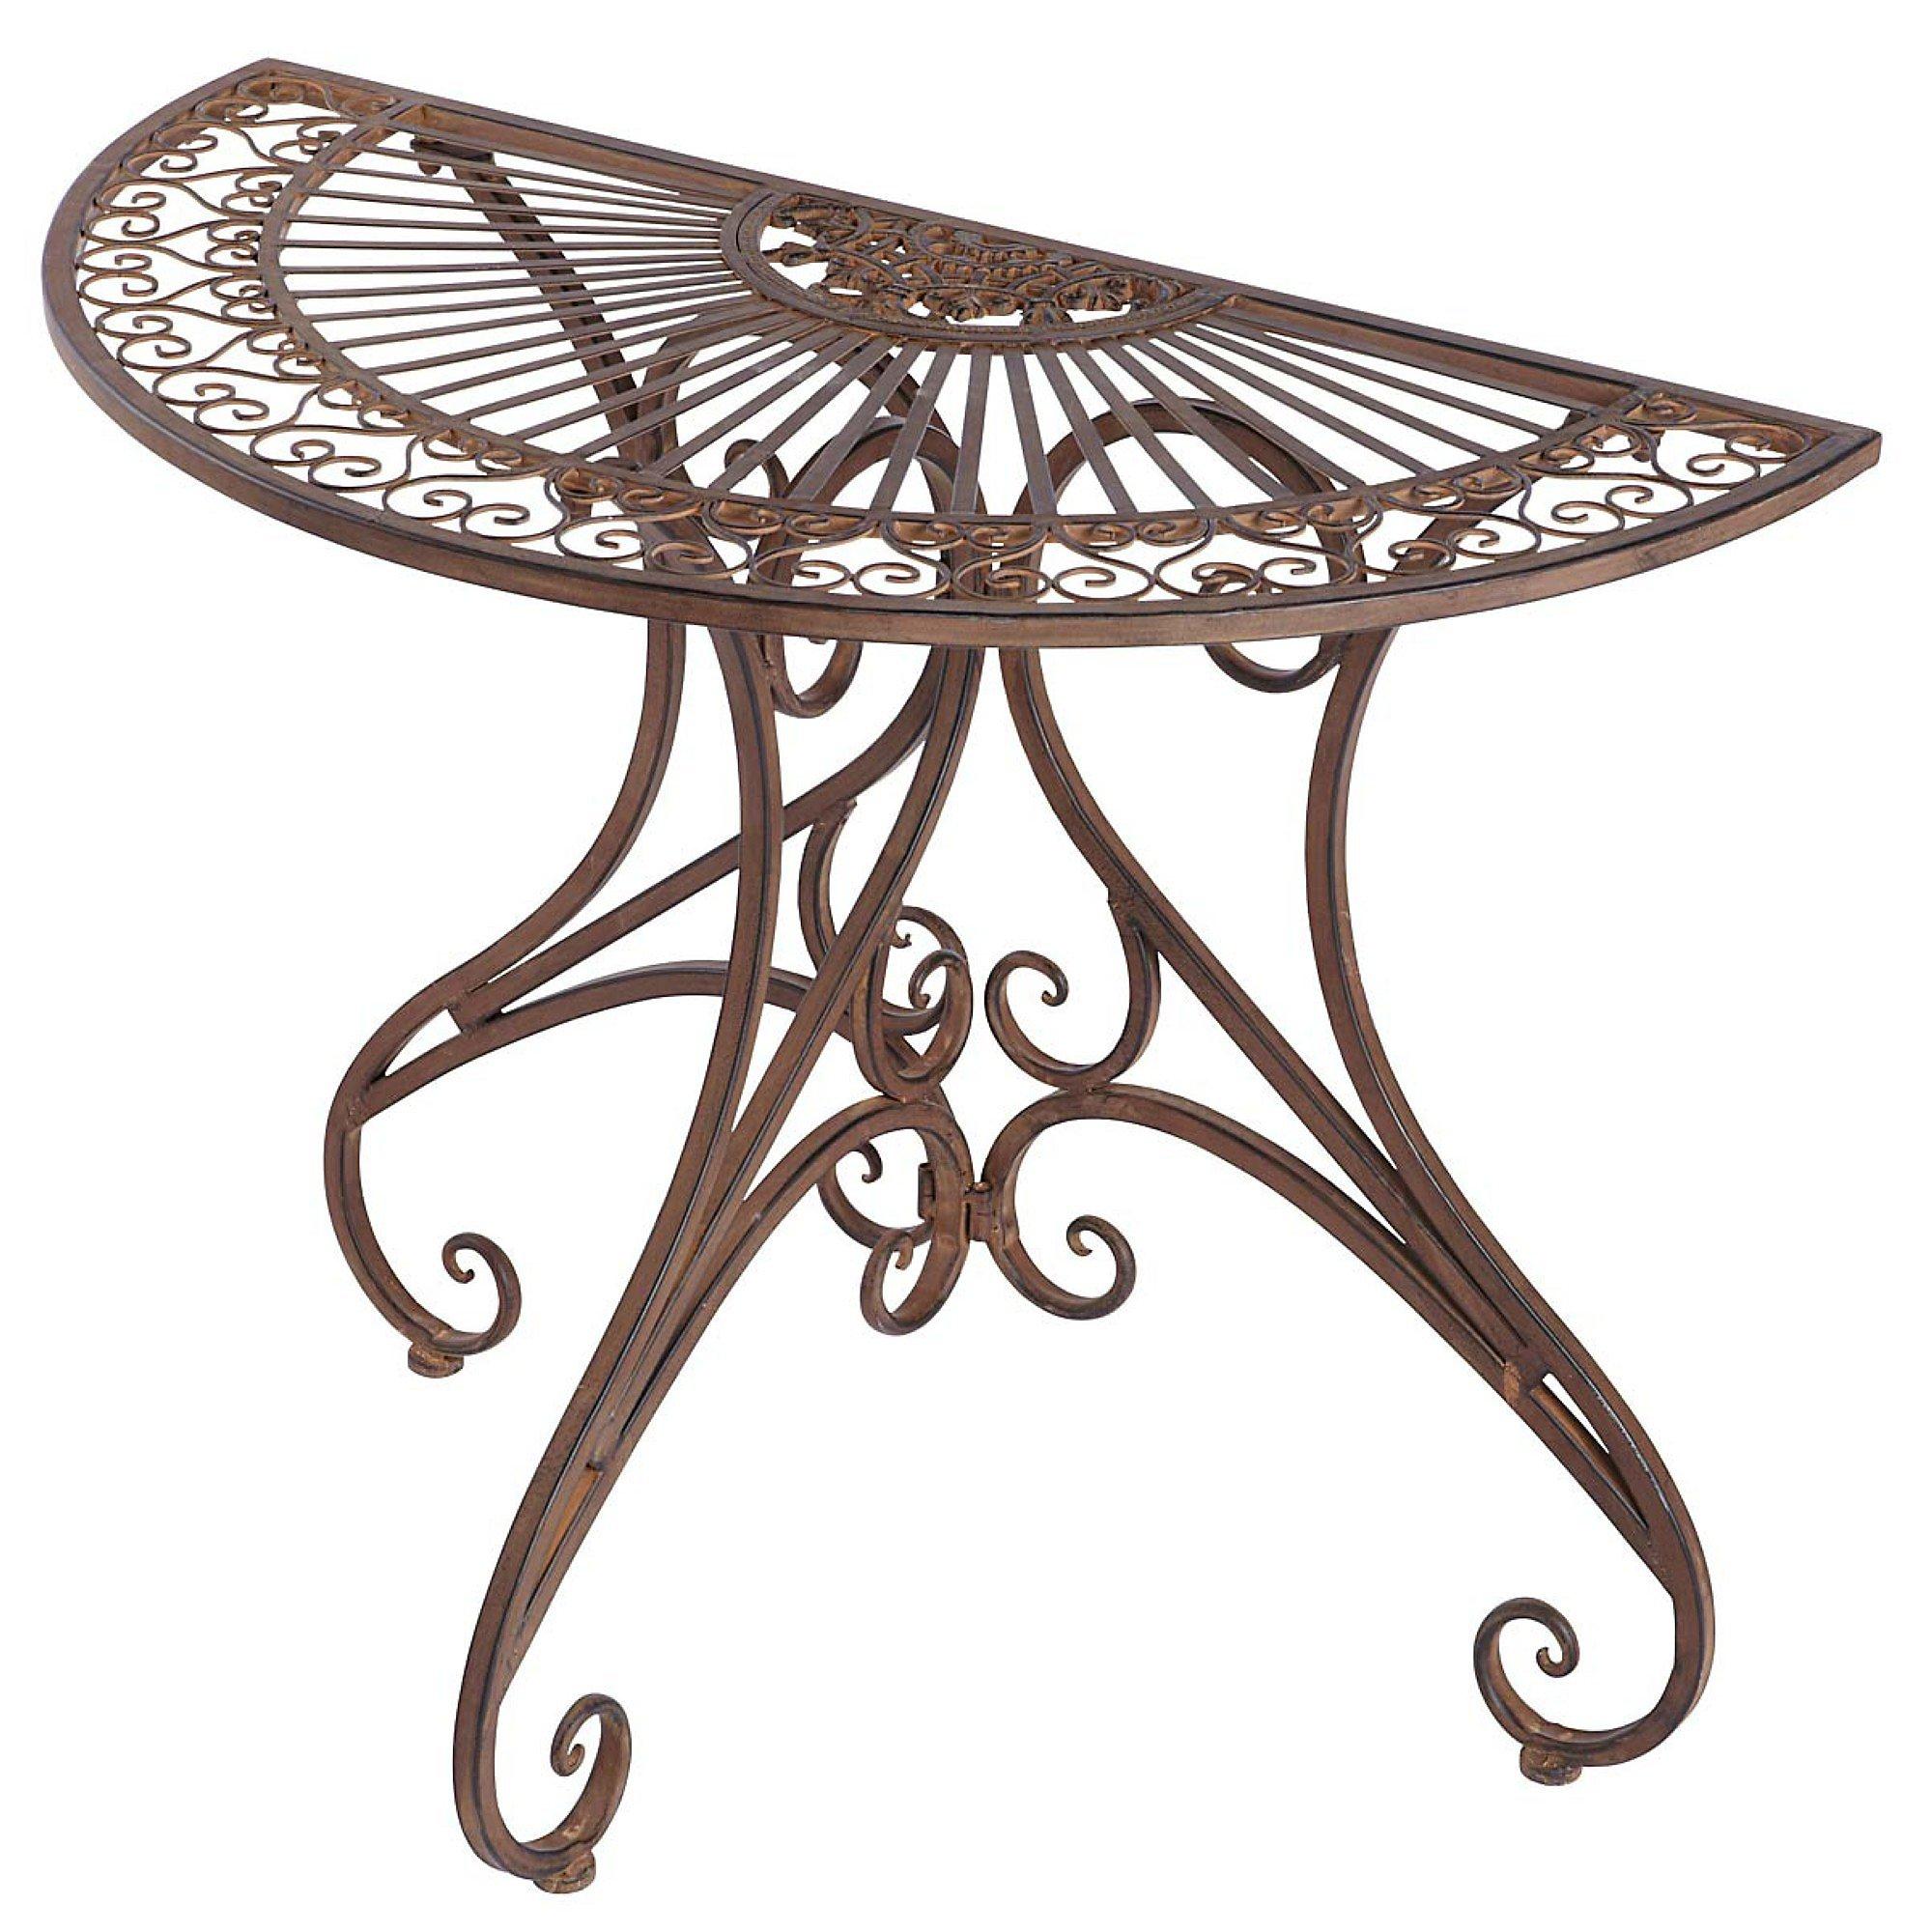 Gartentisch Versailles Halb Metall Antik Braun 74cm Hoch Weltbild De